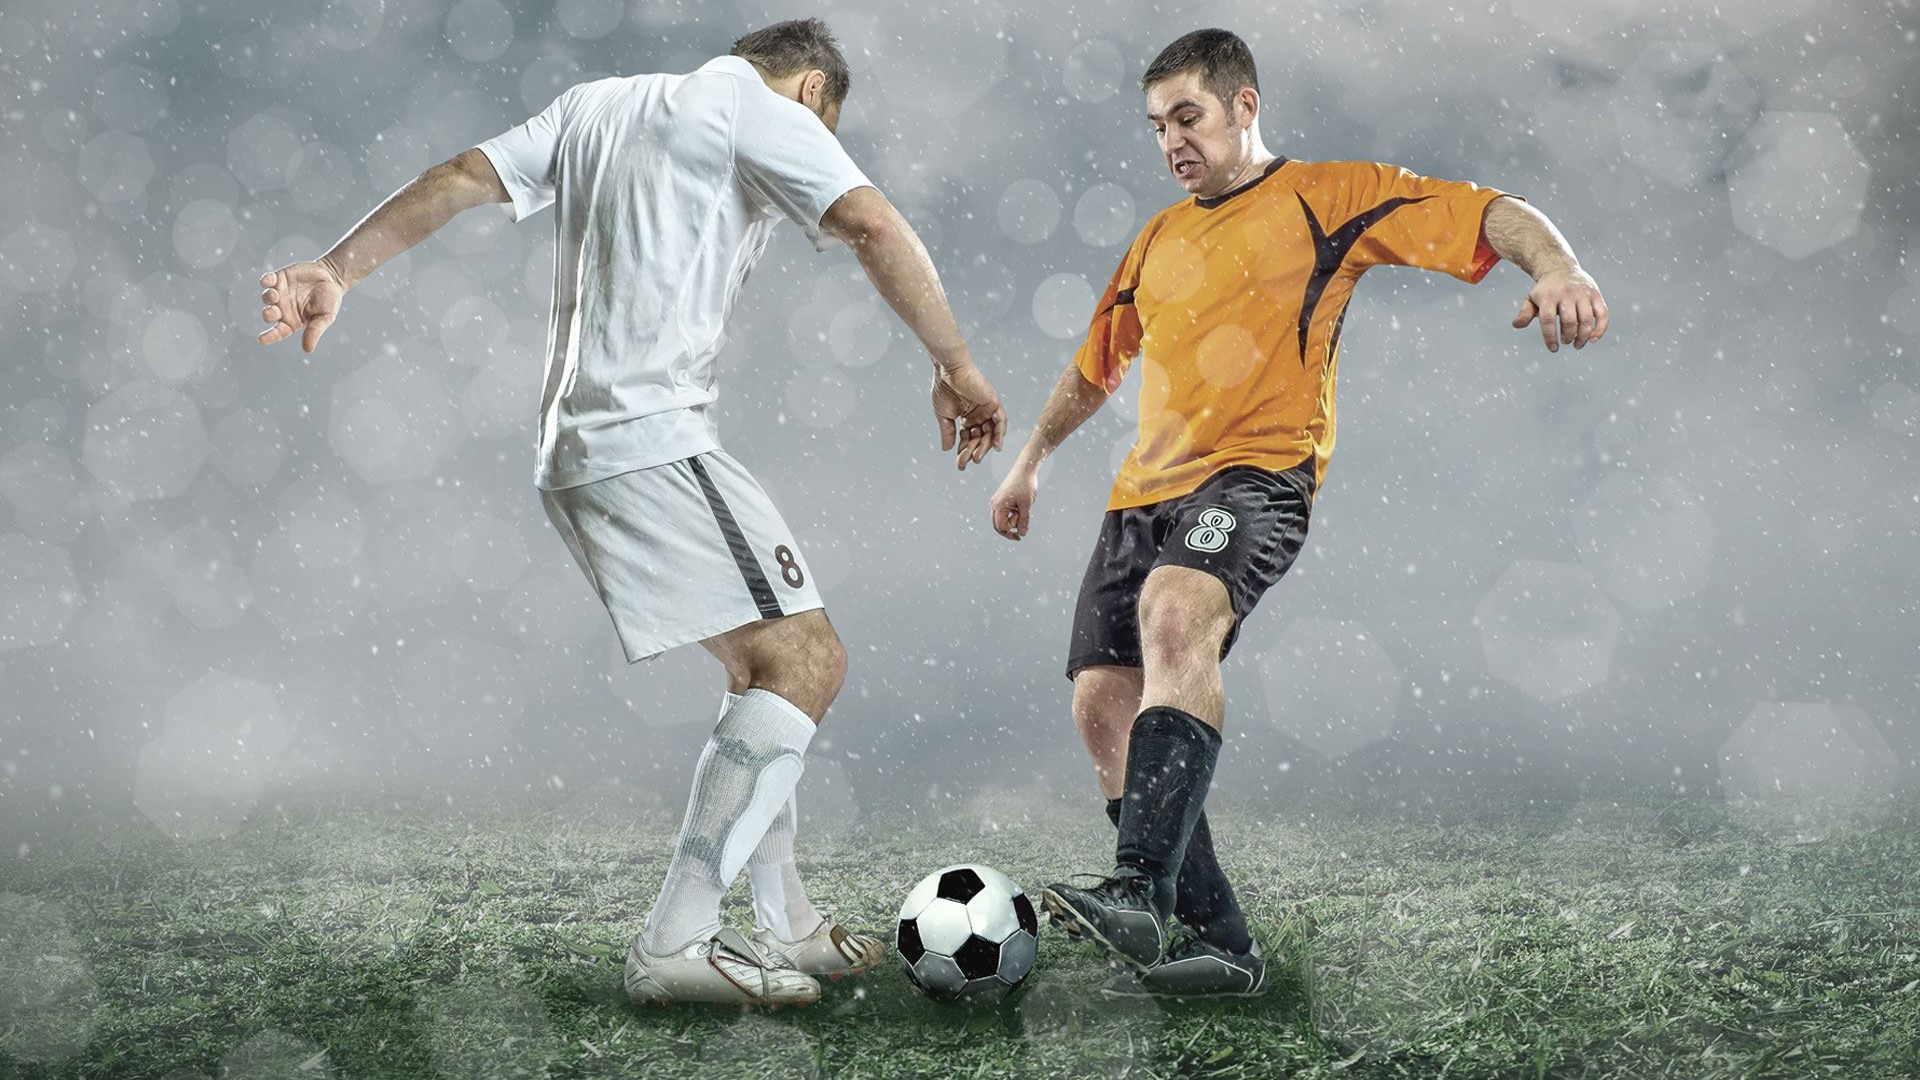 tasman-vs-otago-rugby-online-live